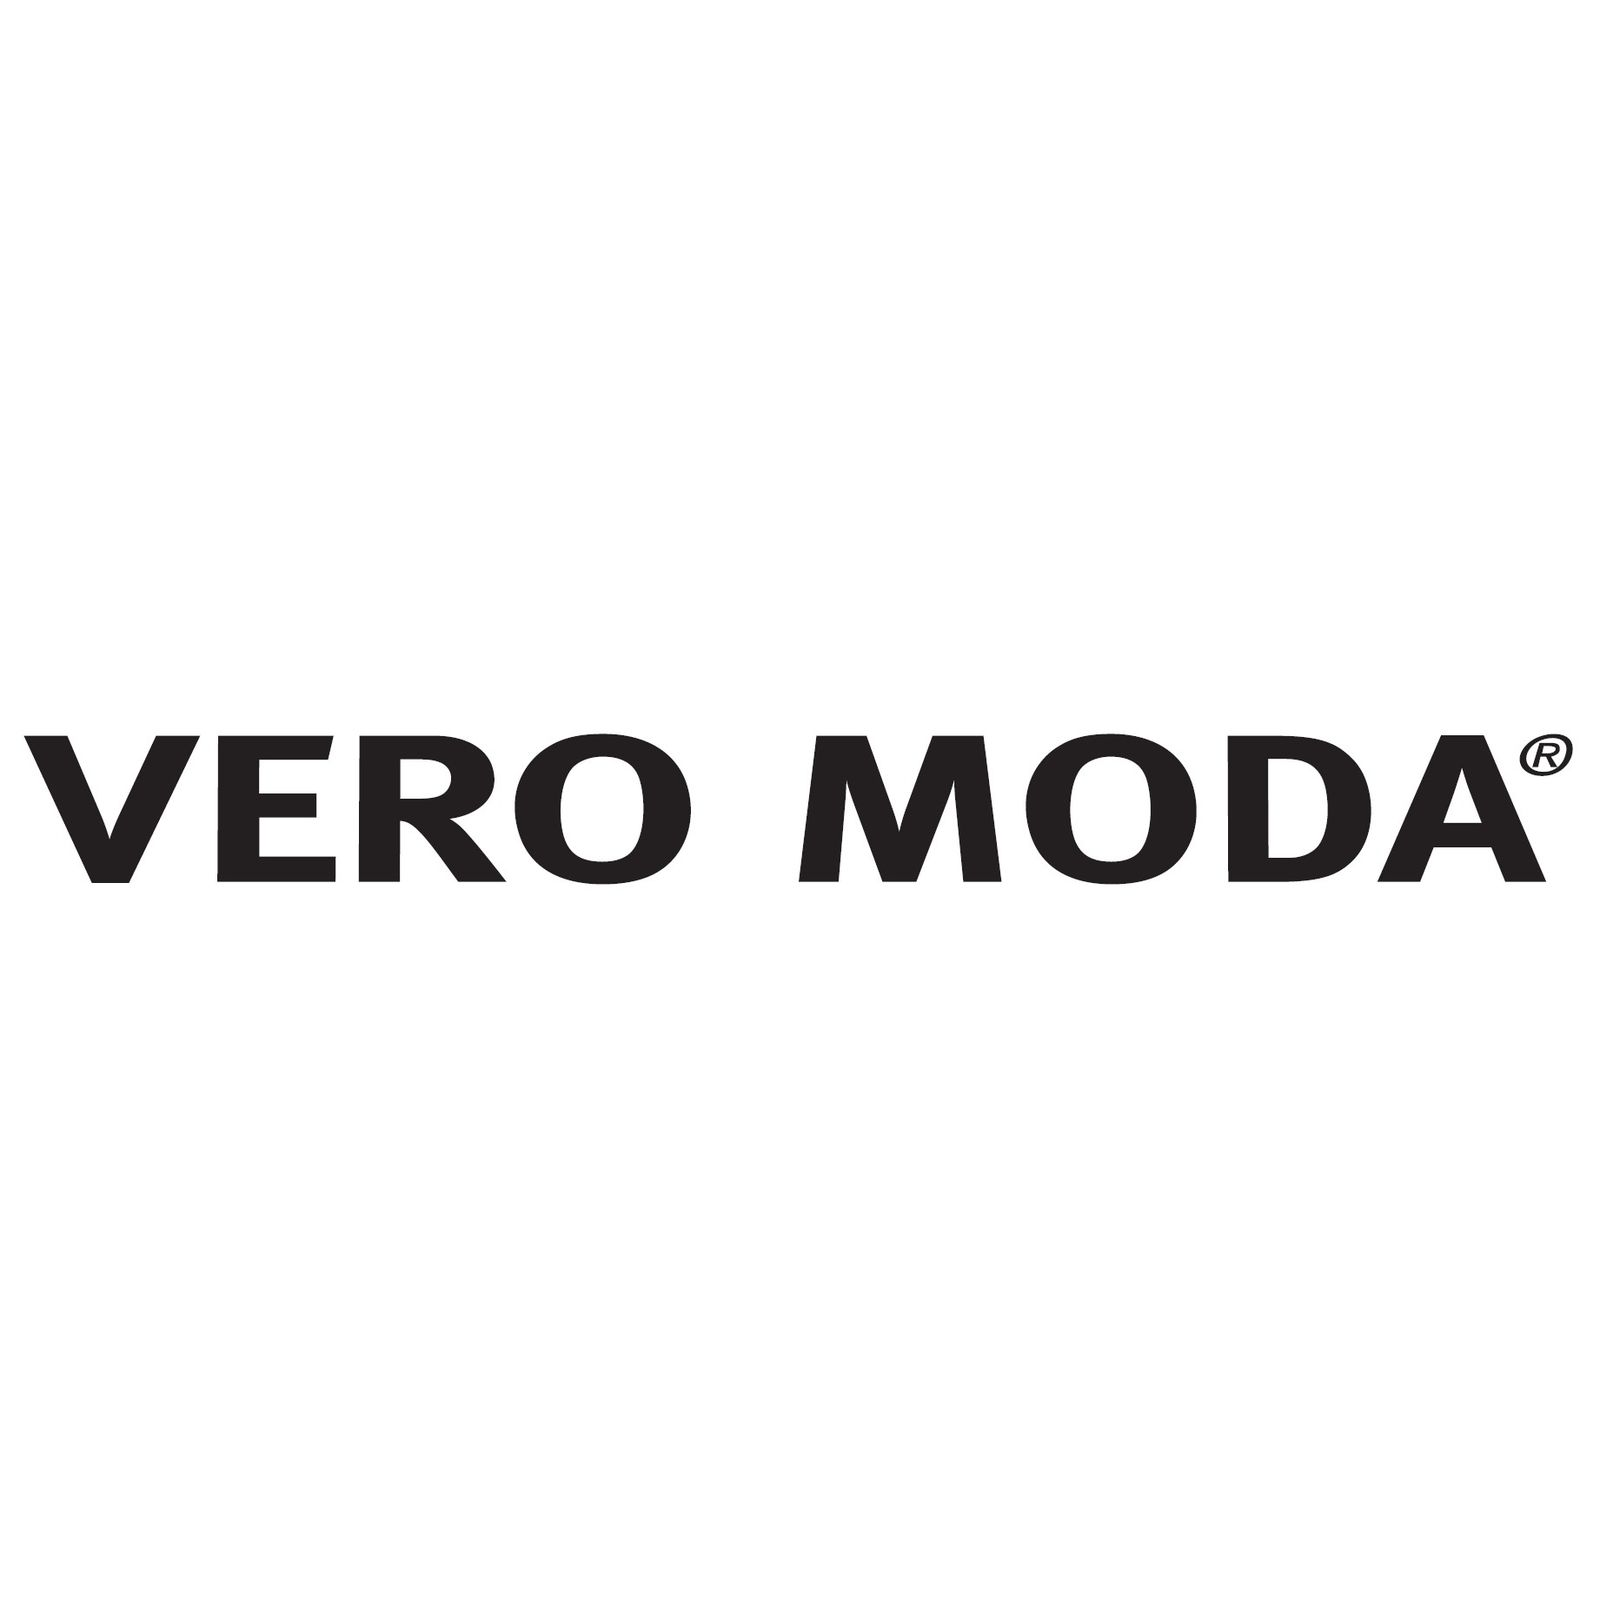 VERO MODA (Image 1)